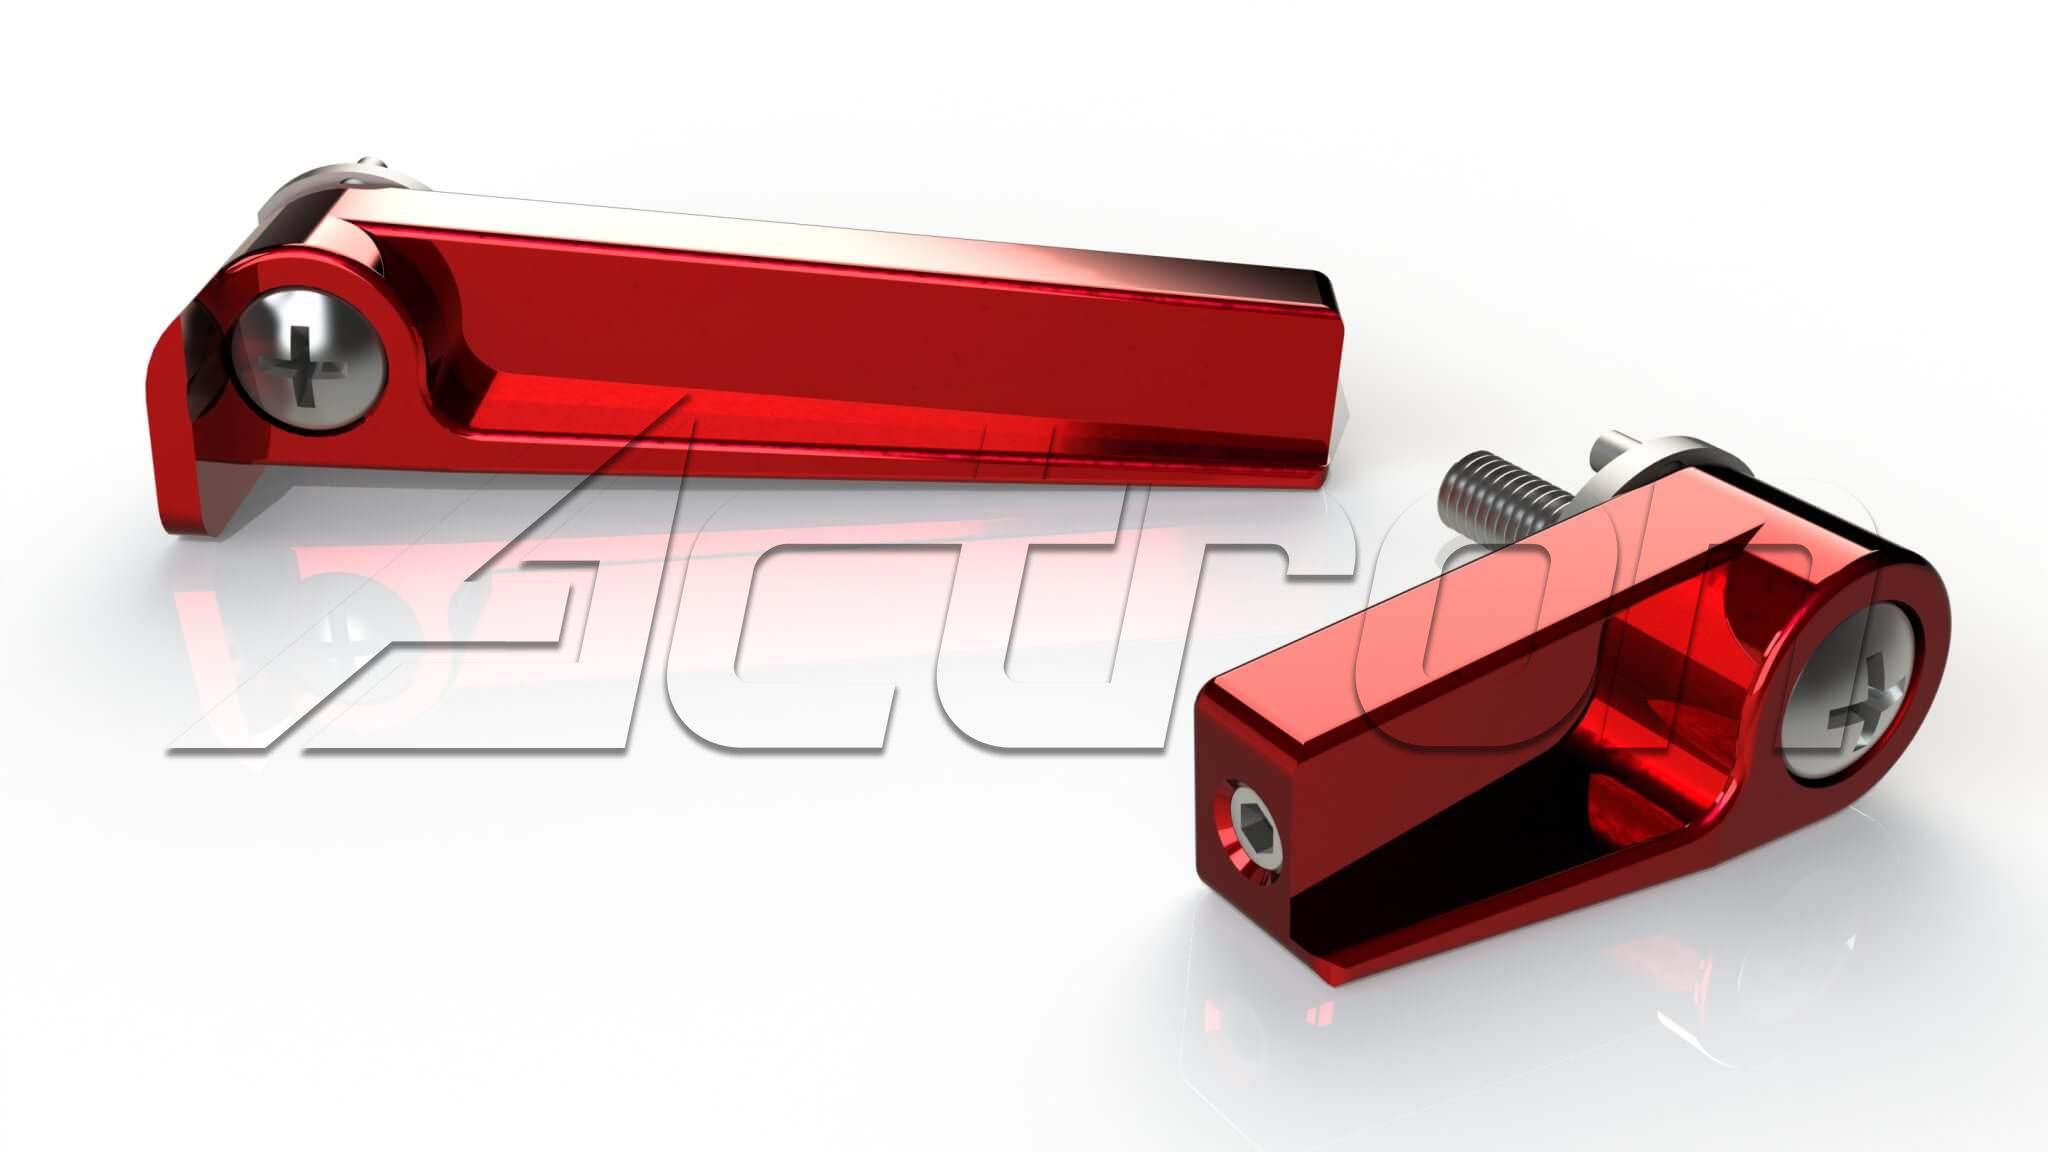 1-4-turn-retainer-4860-a35632.jpg